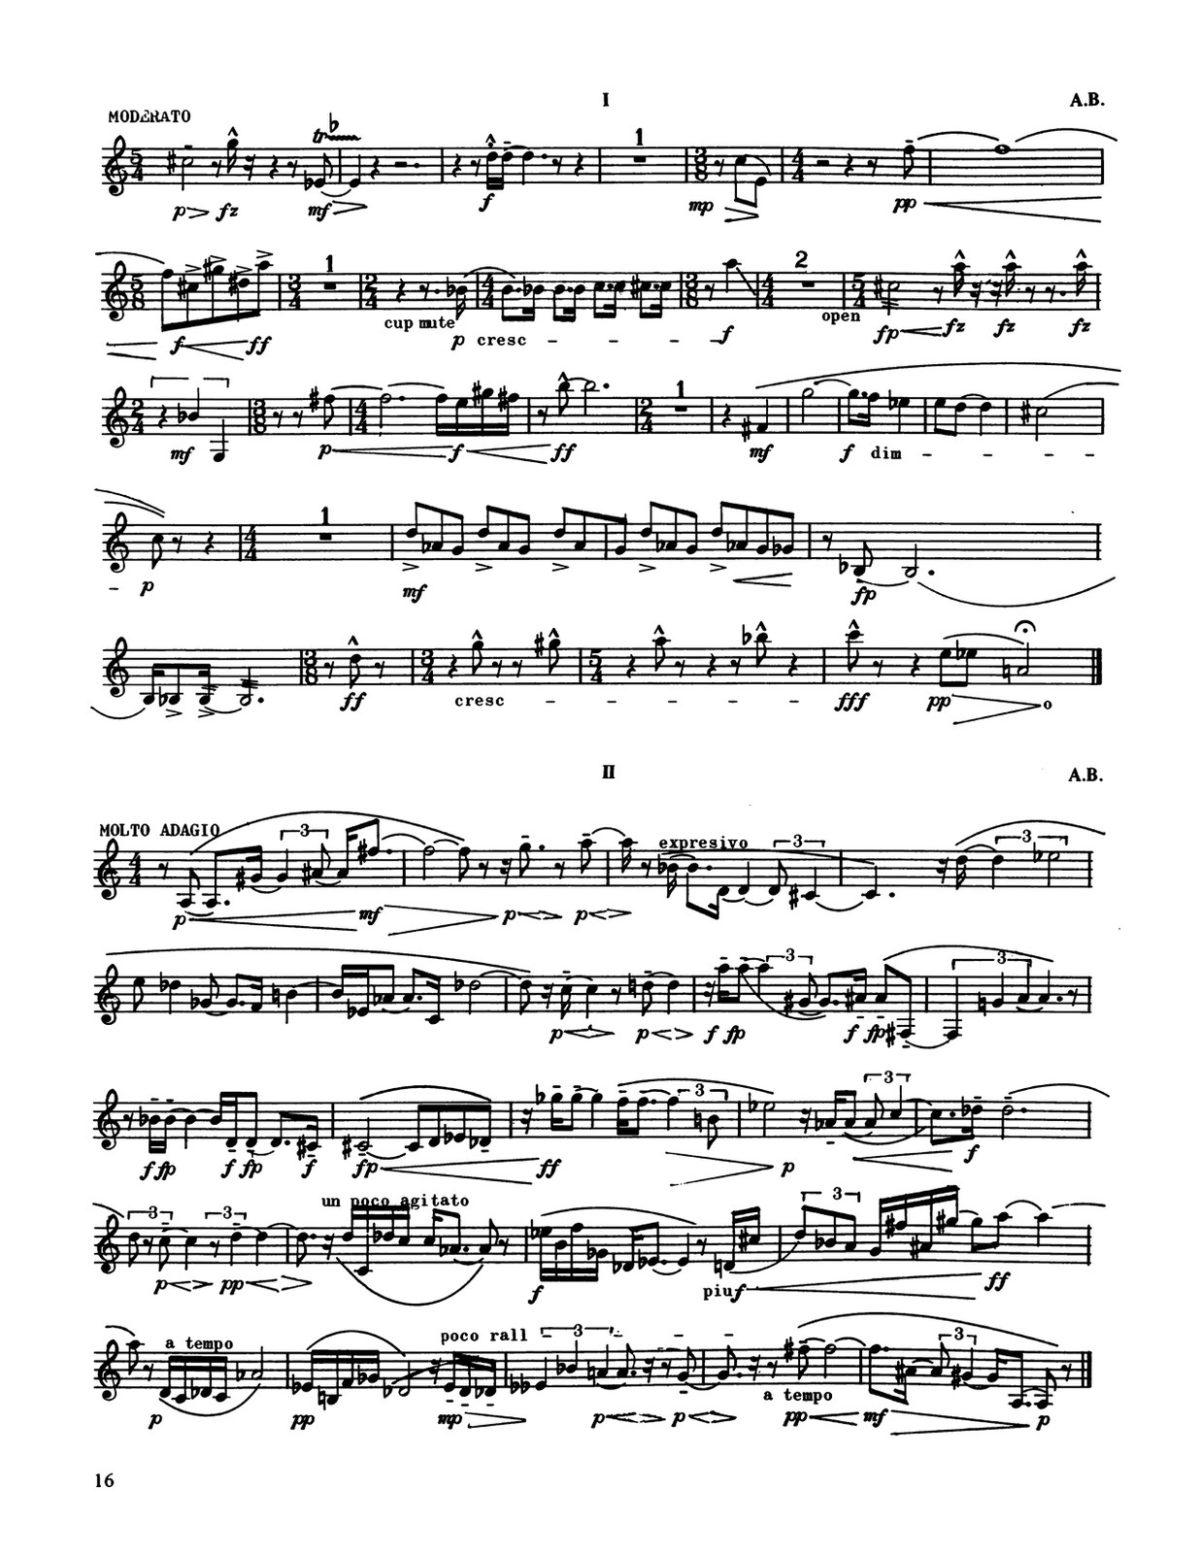 Blatter, Zonn, ann. Hickman Contemporary Trumpet Studies-p20